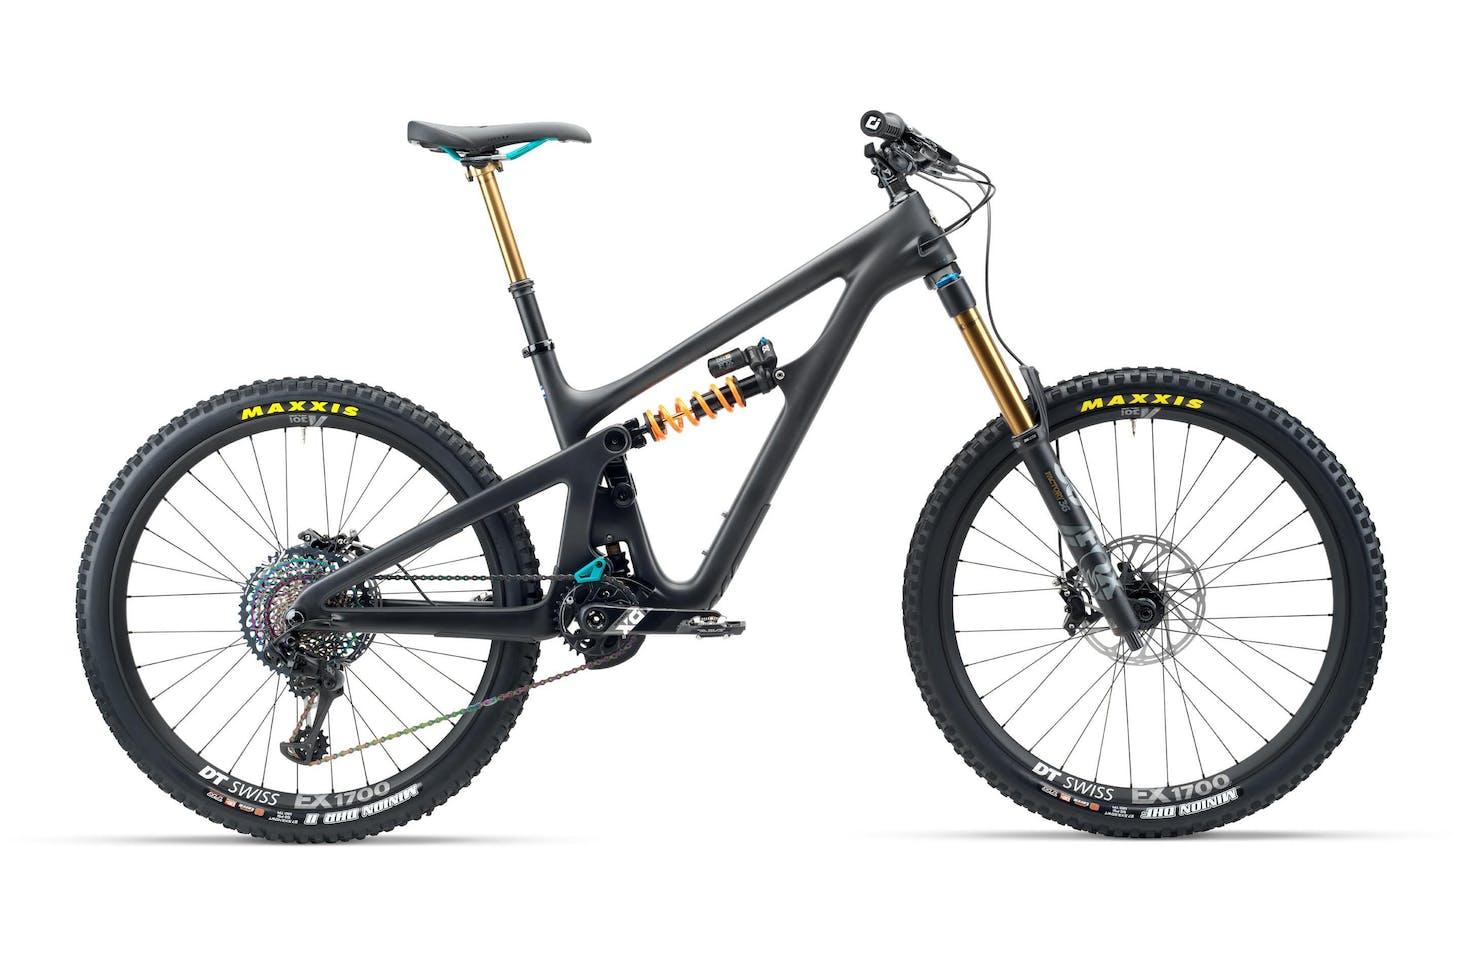 Yeti bike model SB165